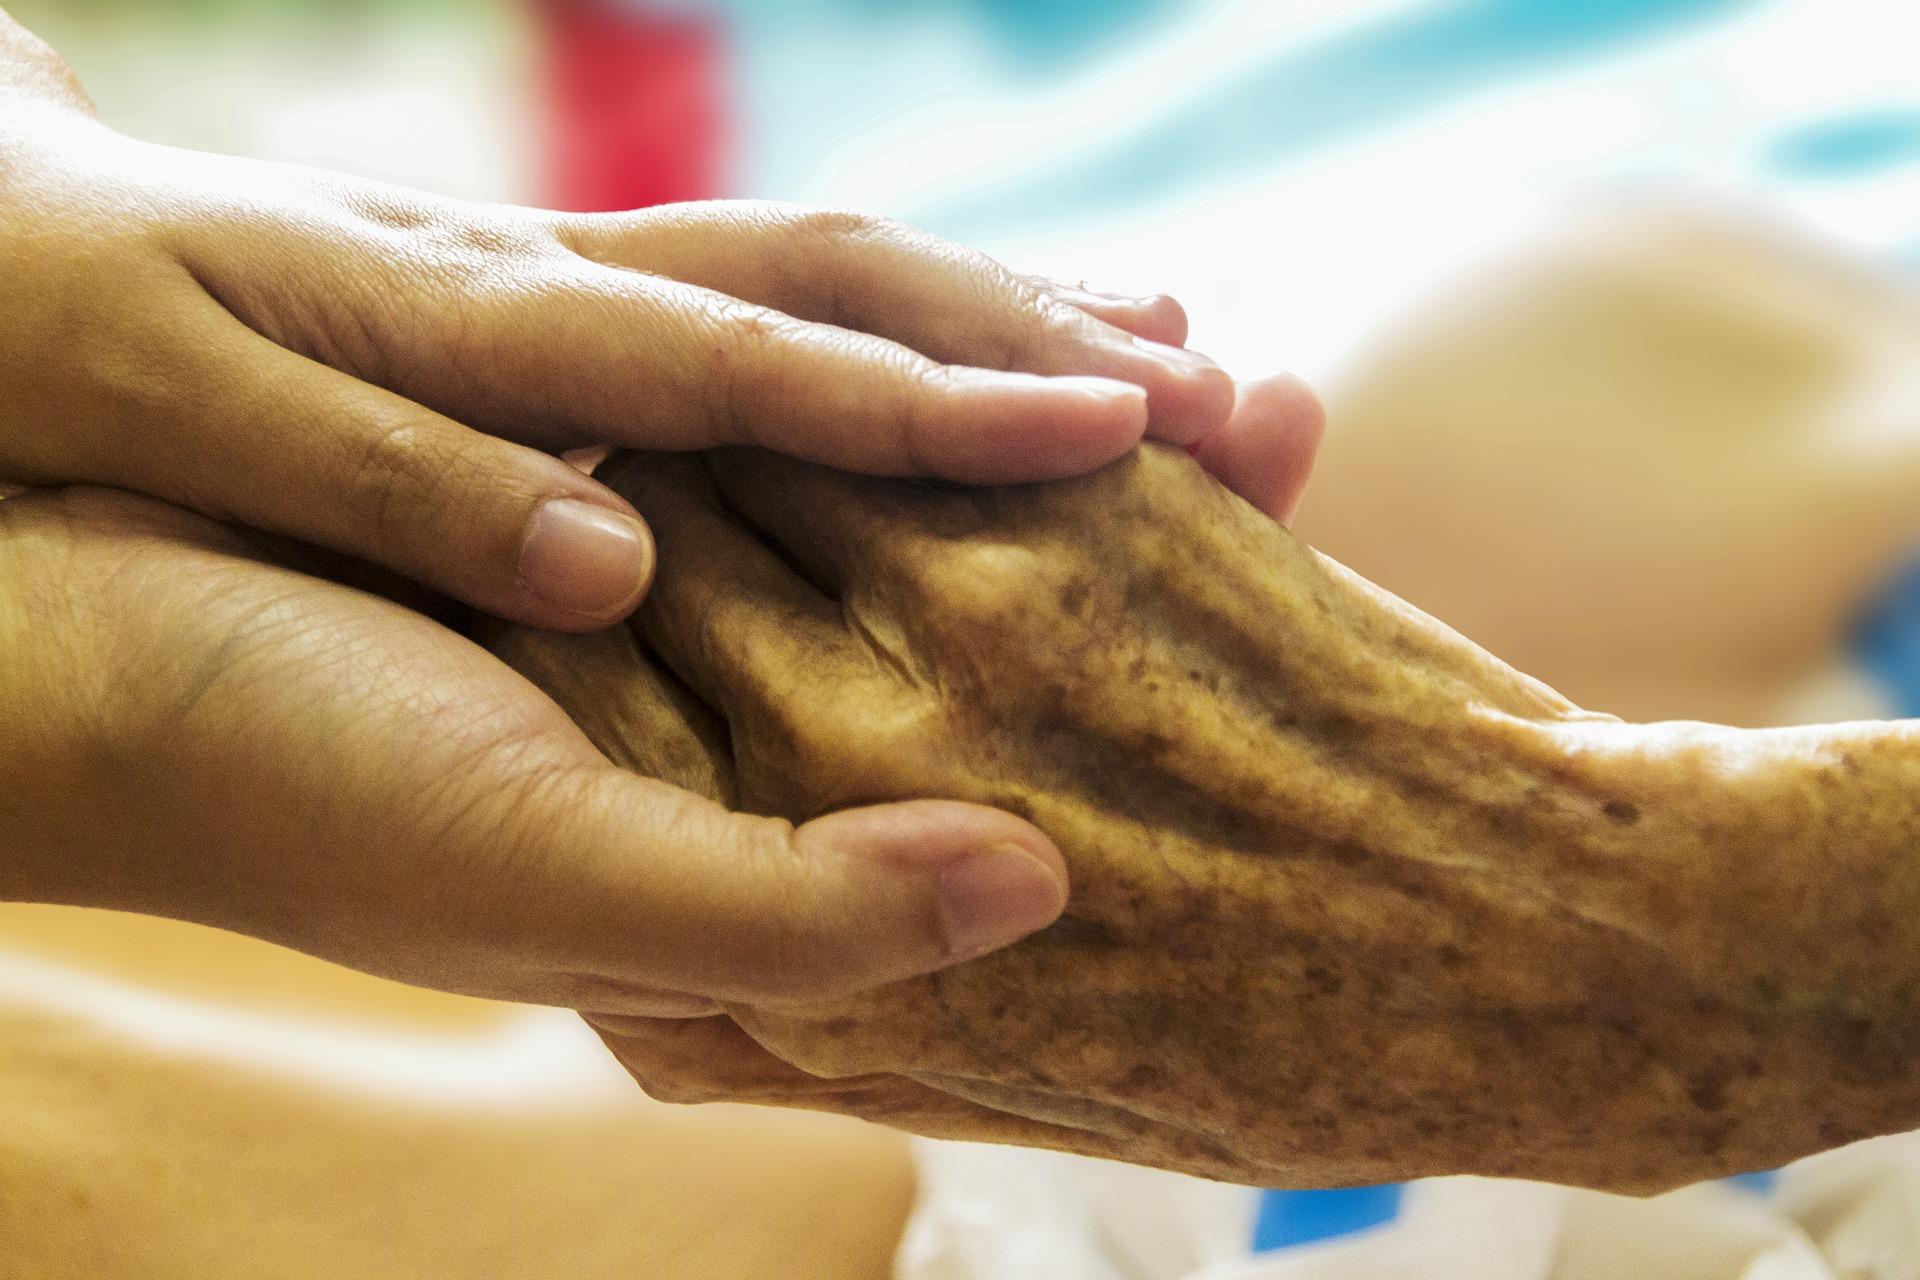 hospice-1793998_1920_unclelkt